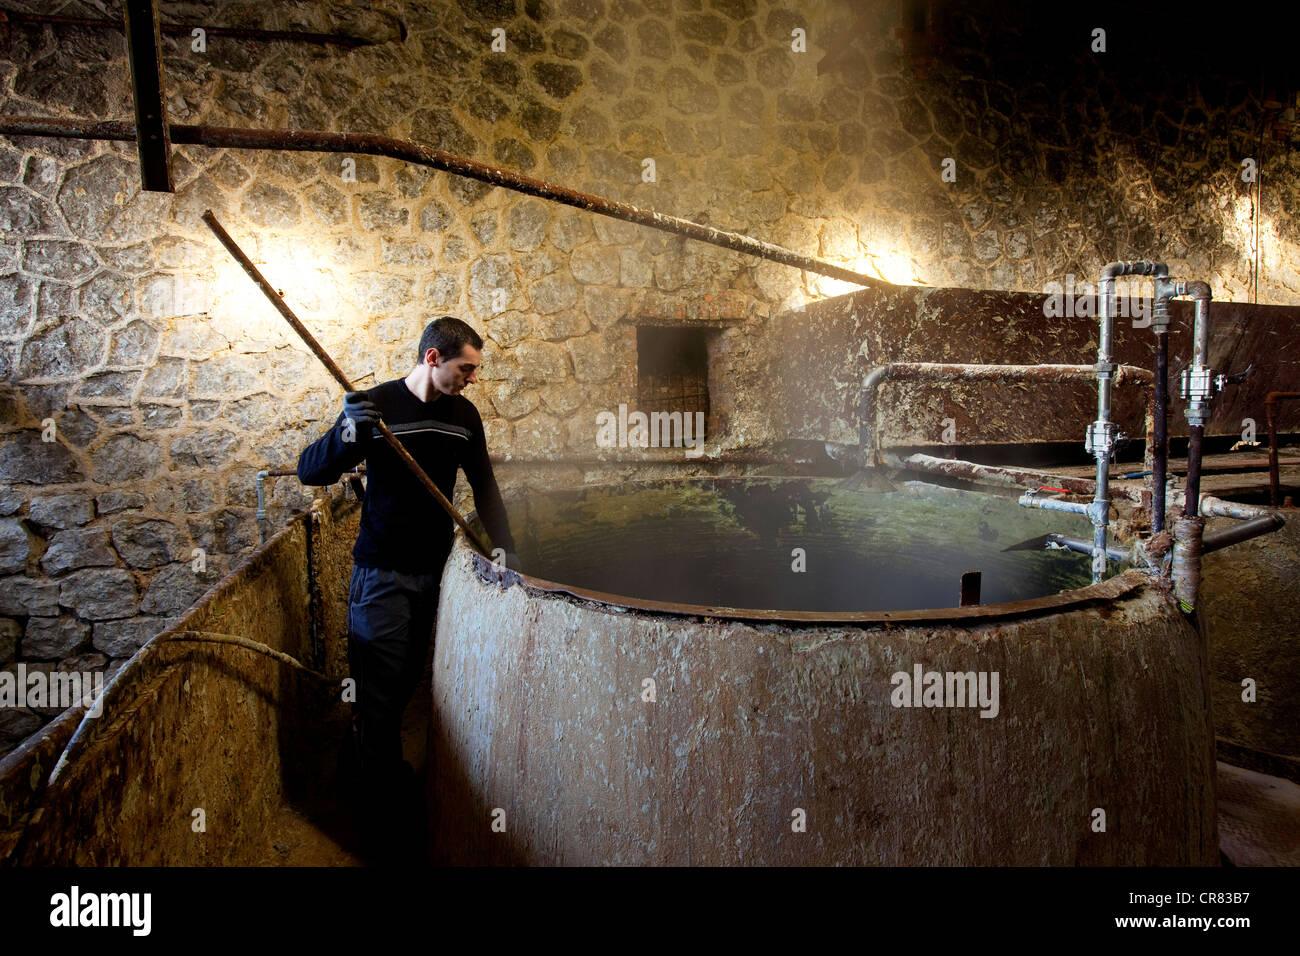 France, Bouches du Rhone, Marseille, the Serail soap, Savon de Marseille, soap pasting into the cauldron - Stock Image